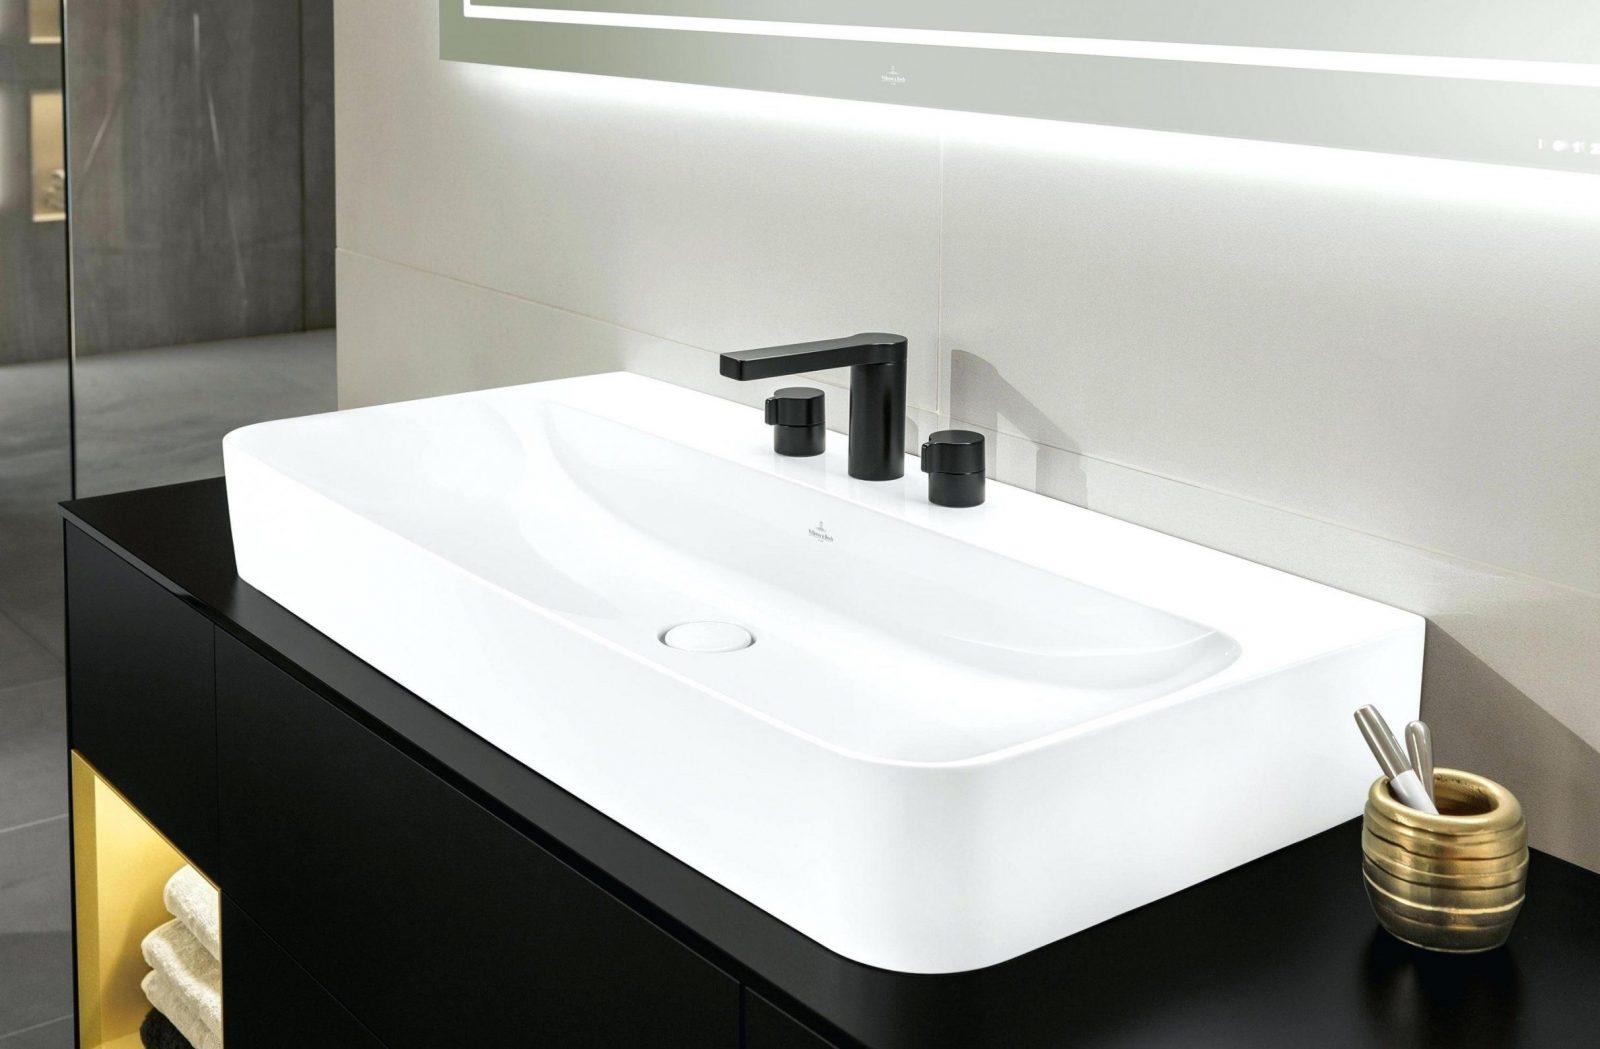 Waschbecken Spritzschutz Arbeitsplatte X Beleuchtung X Betonlampen